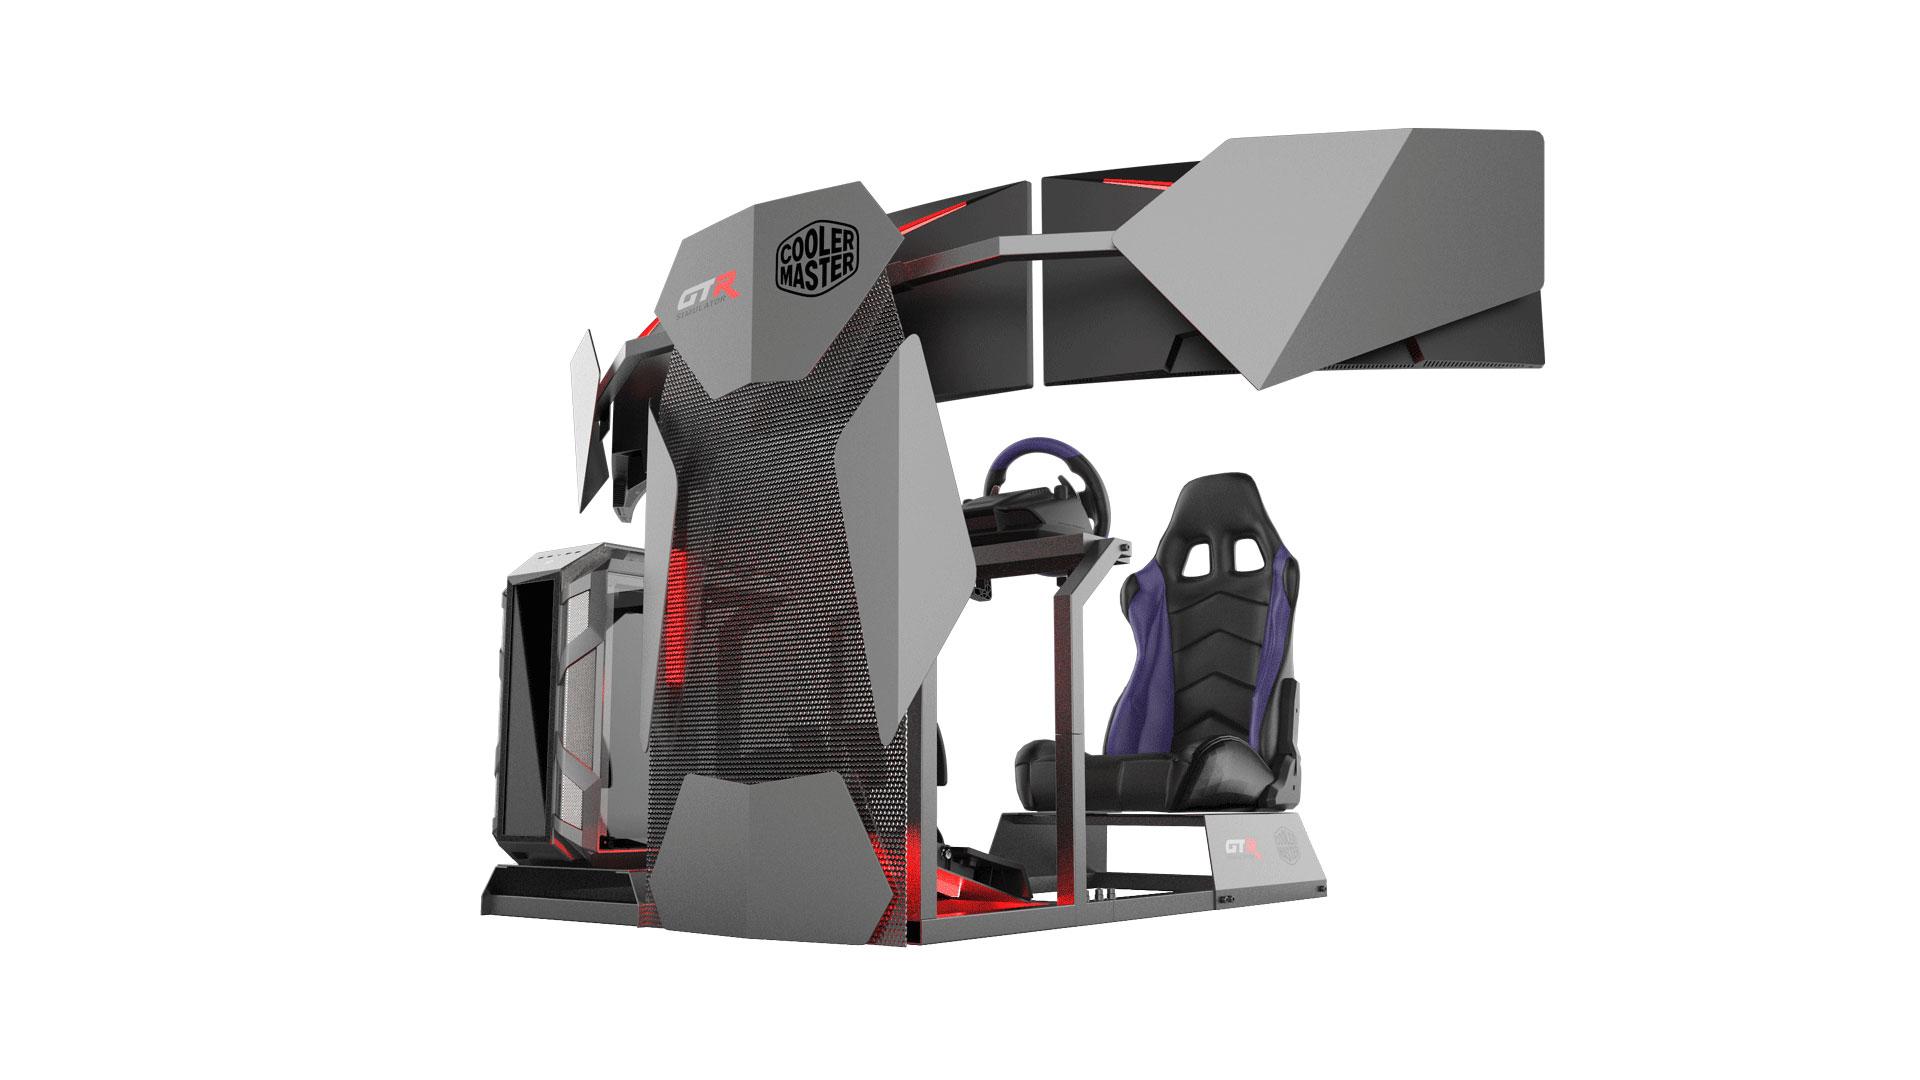 cooler-master-gta-f-racing-rig